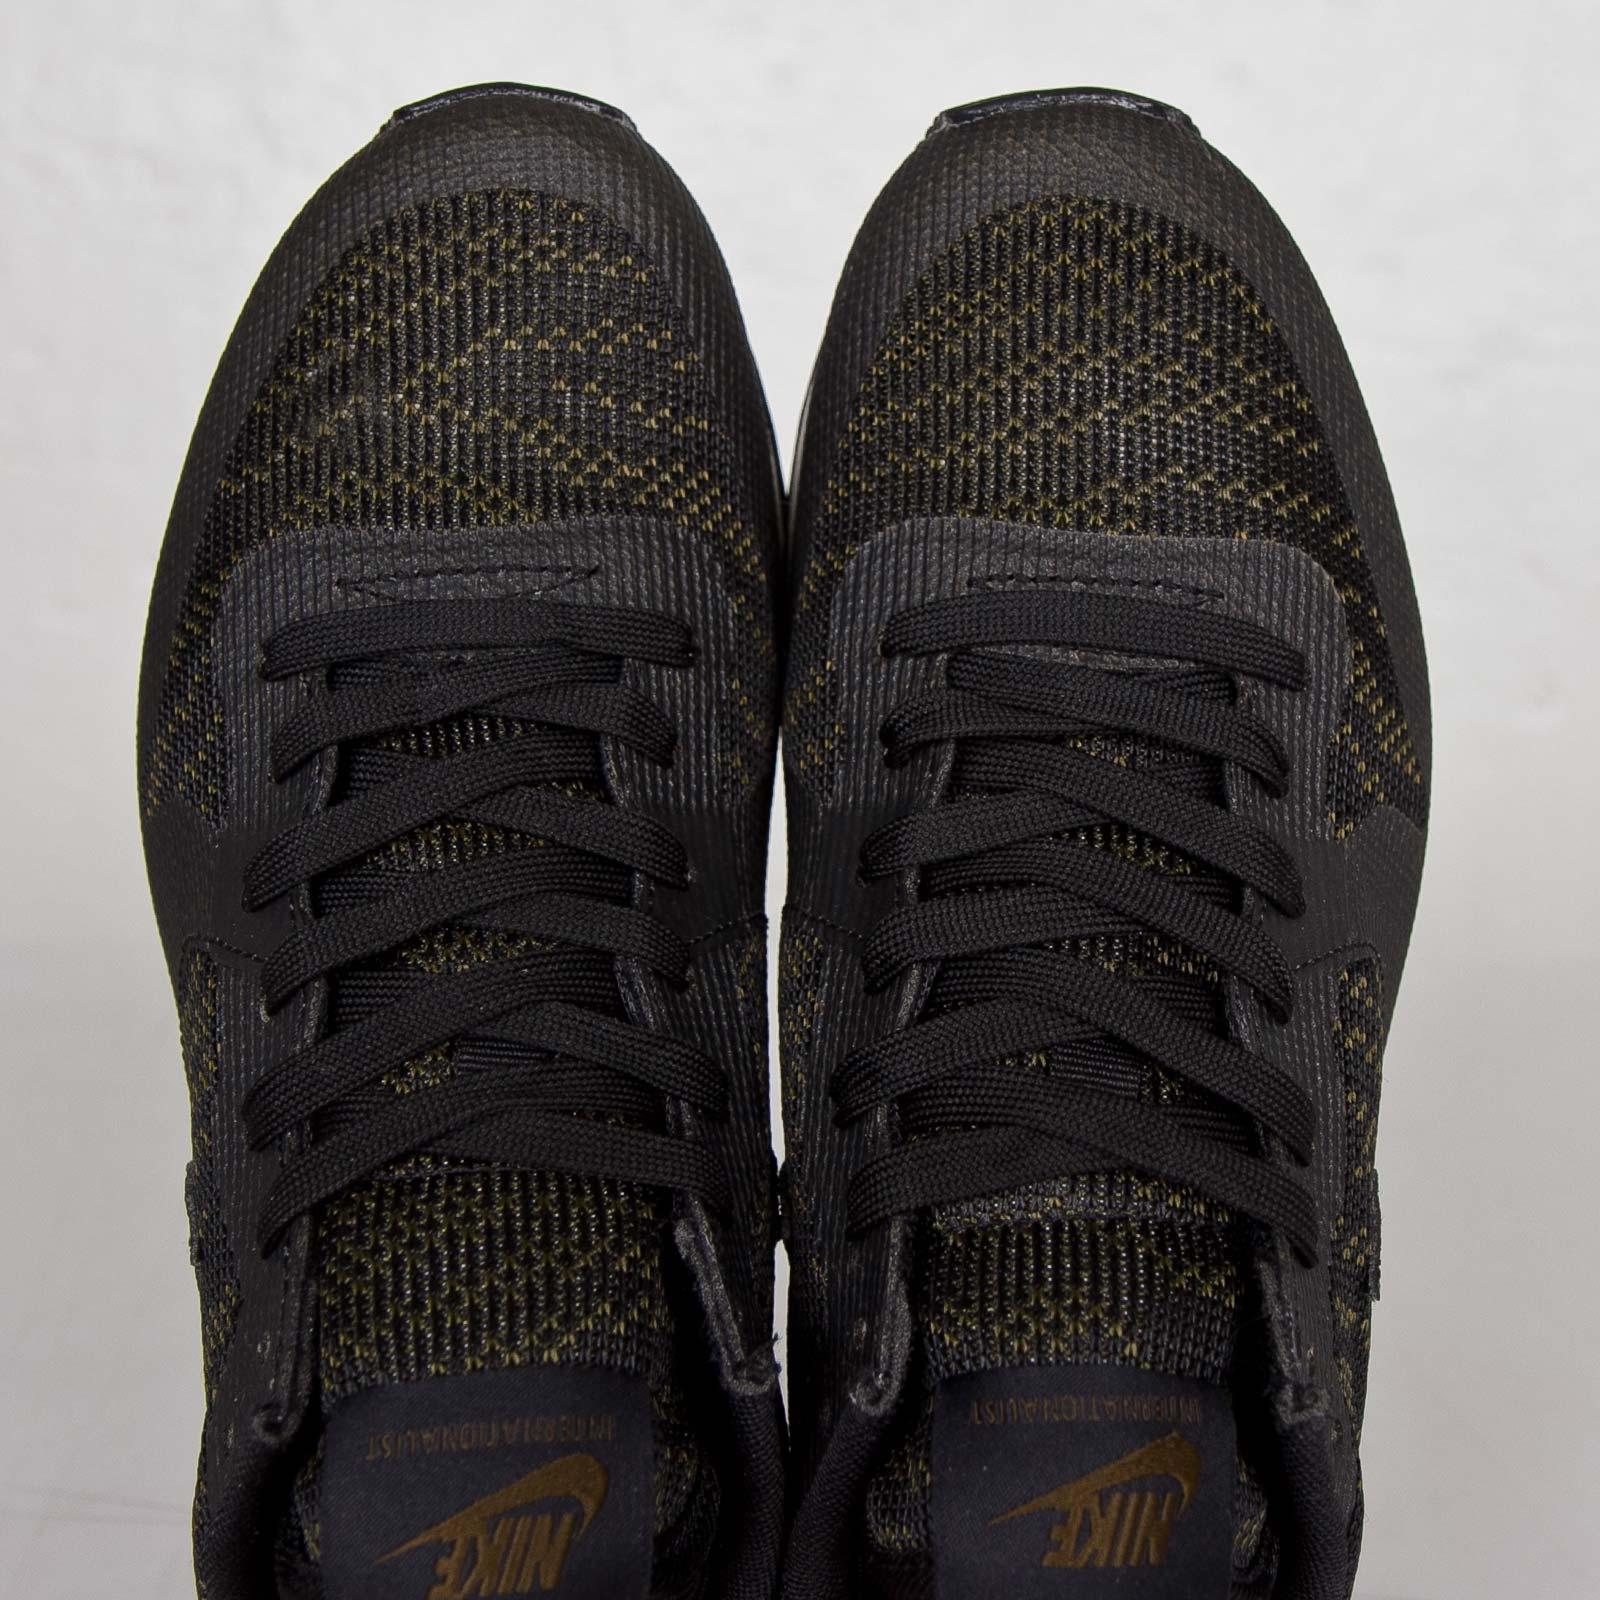 timeless design b95ae e5adc Nike W Internationalist Knit Jacquard - 7. Close